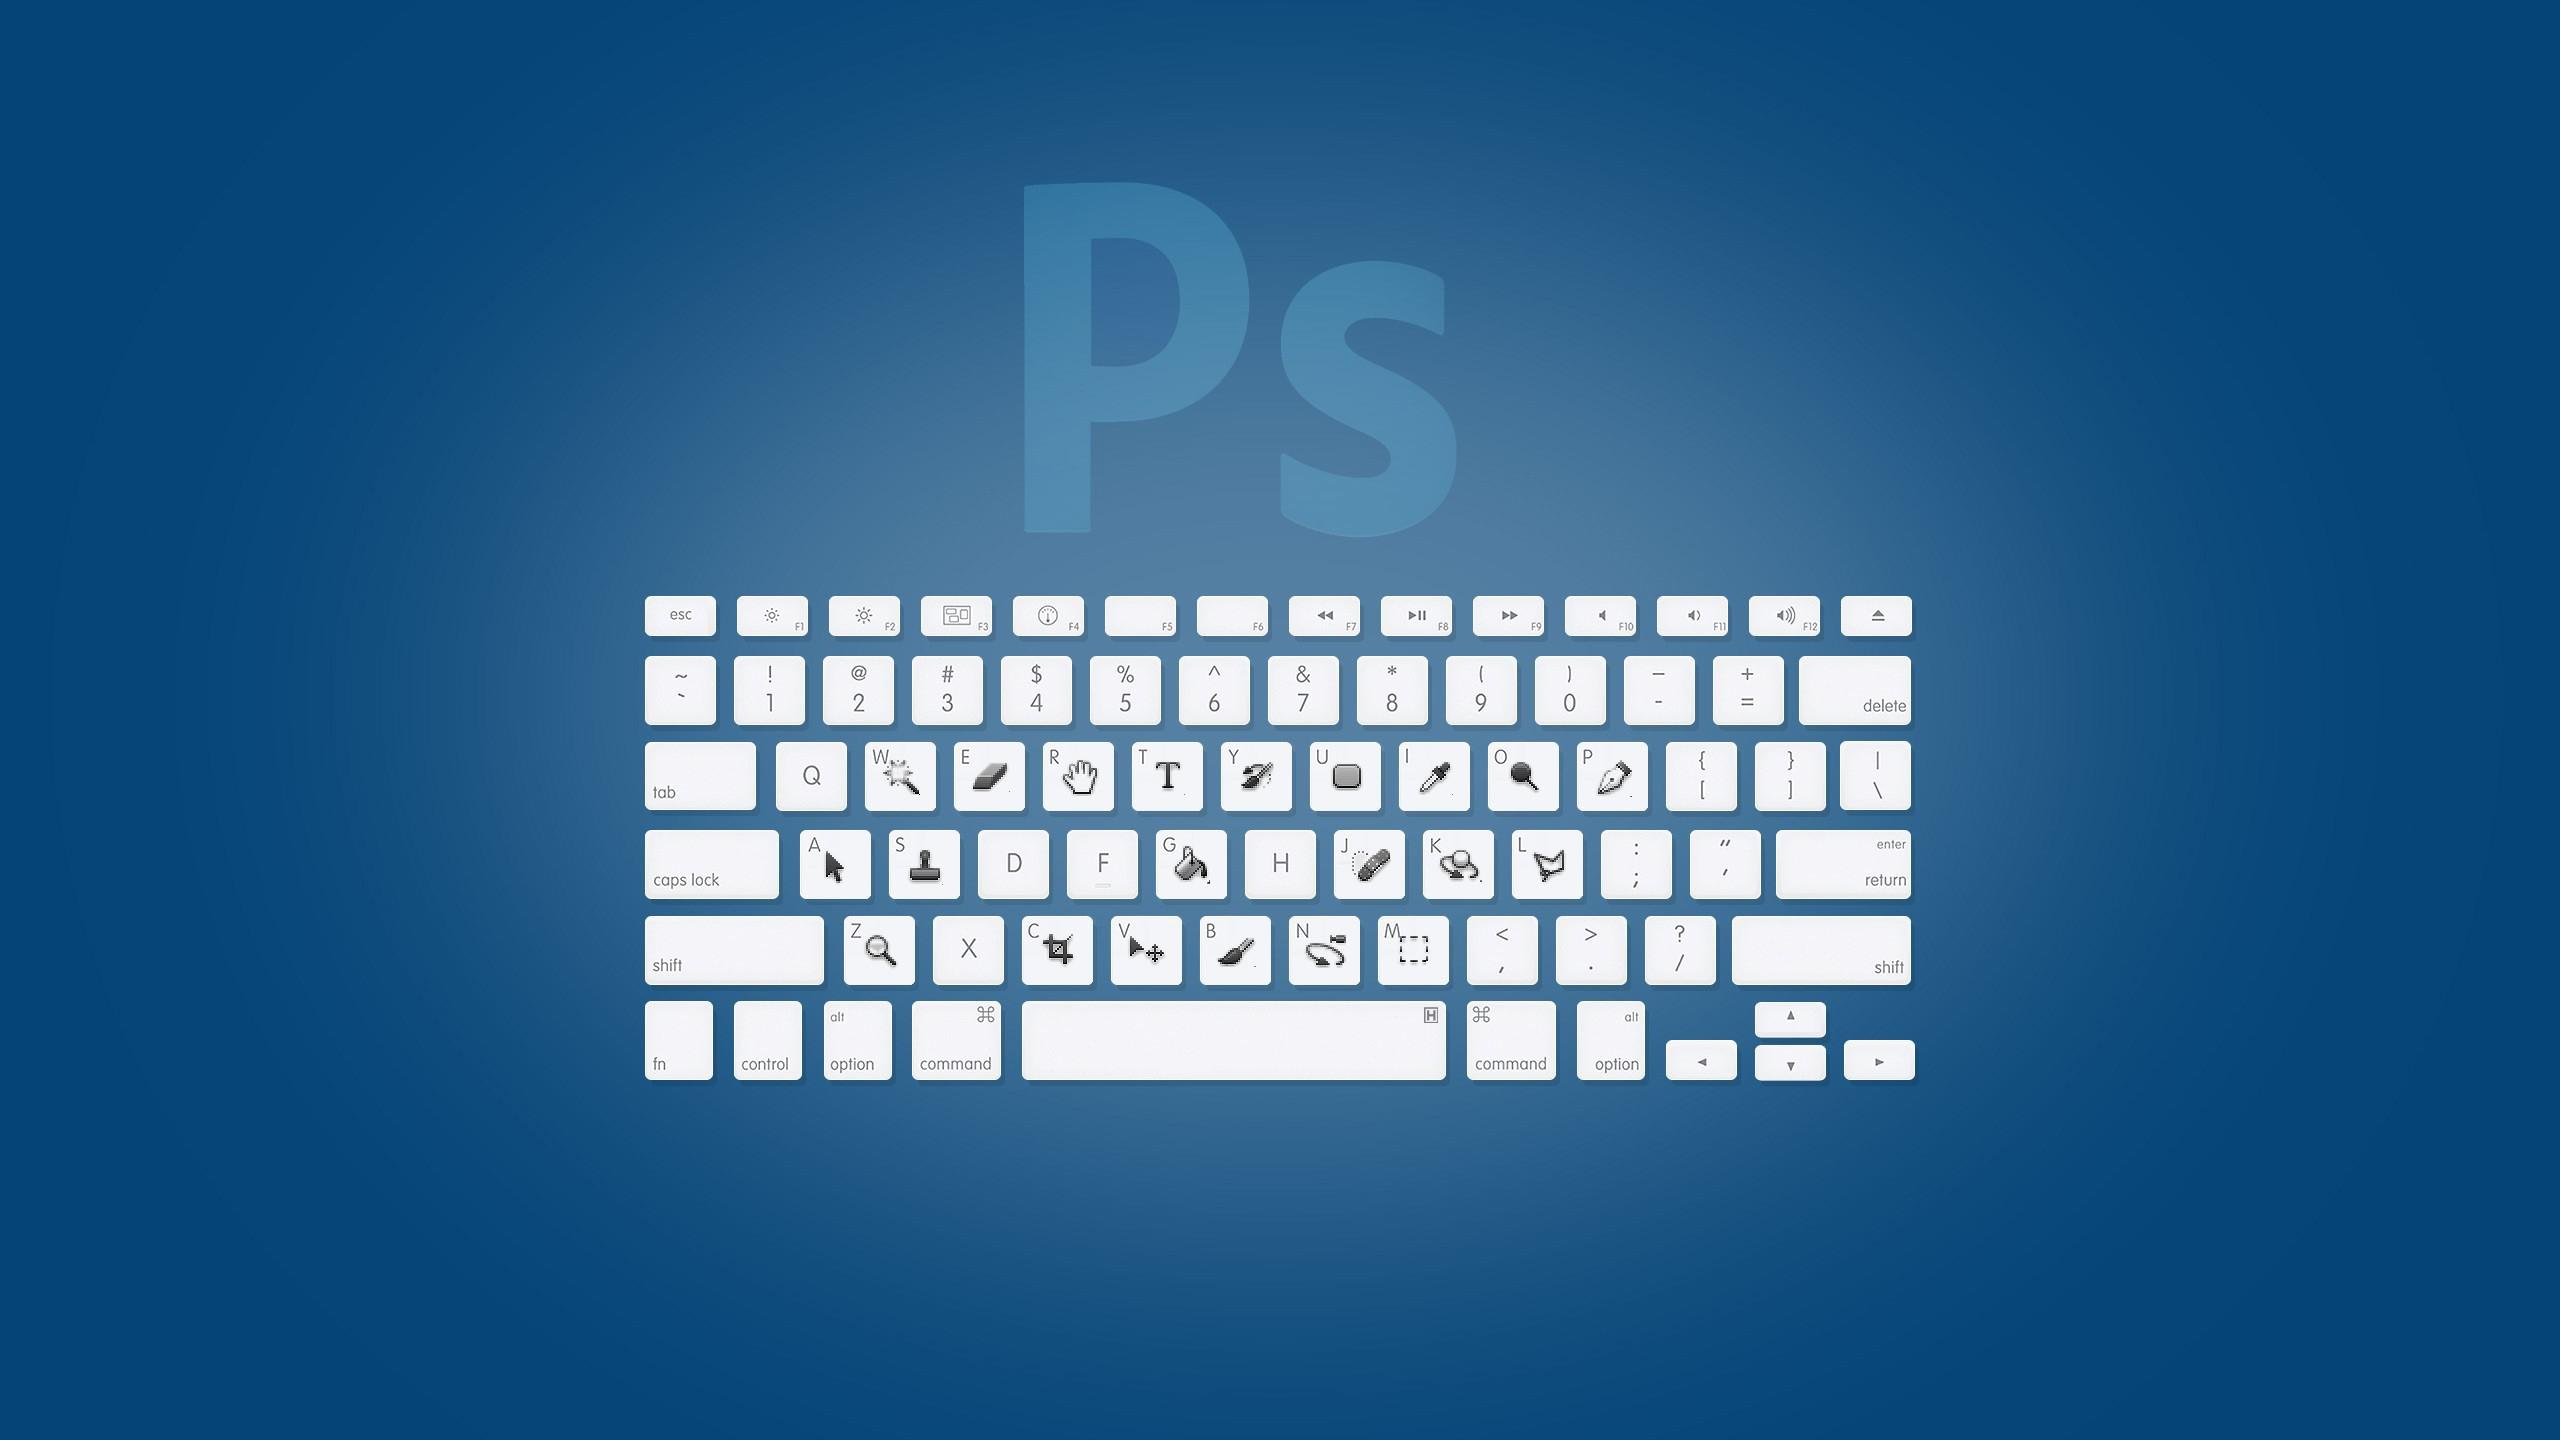 Photoshop CC2015.5.x,Adobe Photoshop CC 2015,Adobe CC 2015,Photoshop CC 2015.5 17.0.1,PhotoshopCC2015.5.1,Adobe Creative Cloud 2015设计套件,ps2015,ps2016,Portable by PortableWares,Photoshop破解补丁,Photoshop破解版,Photoshop精简版,Photoshop中文特别版,Photoshop特别版,Photoshop精简安装版,Photoshop绿色版,Photoshop官方版,Adobe Photoshop 15,Photoshop2015,Photoshop2015绿色版,Photoshop CC破解补丁,Photoshop CC注册机,ps激活,ps破解,ps绿色版,ps破解补丁,ps注册机,Photoshop注册机,Adobe Universal Patcher v1.5 By Painter,adobe.snr.patch-painter,顶级图像处理软件,图像后期处理工具,婚纱摄影处理,设计工具,大型图像处理工具,Adobe Photoshop CC 2015.5 17.0.1.156